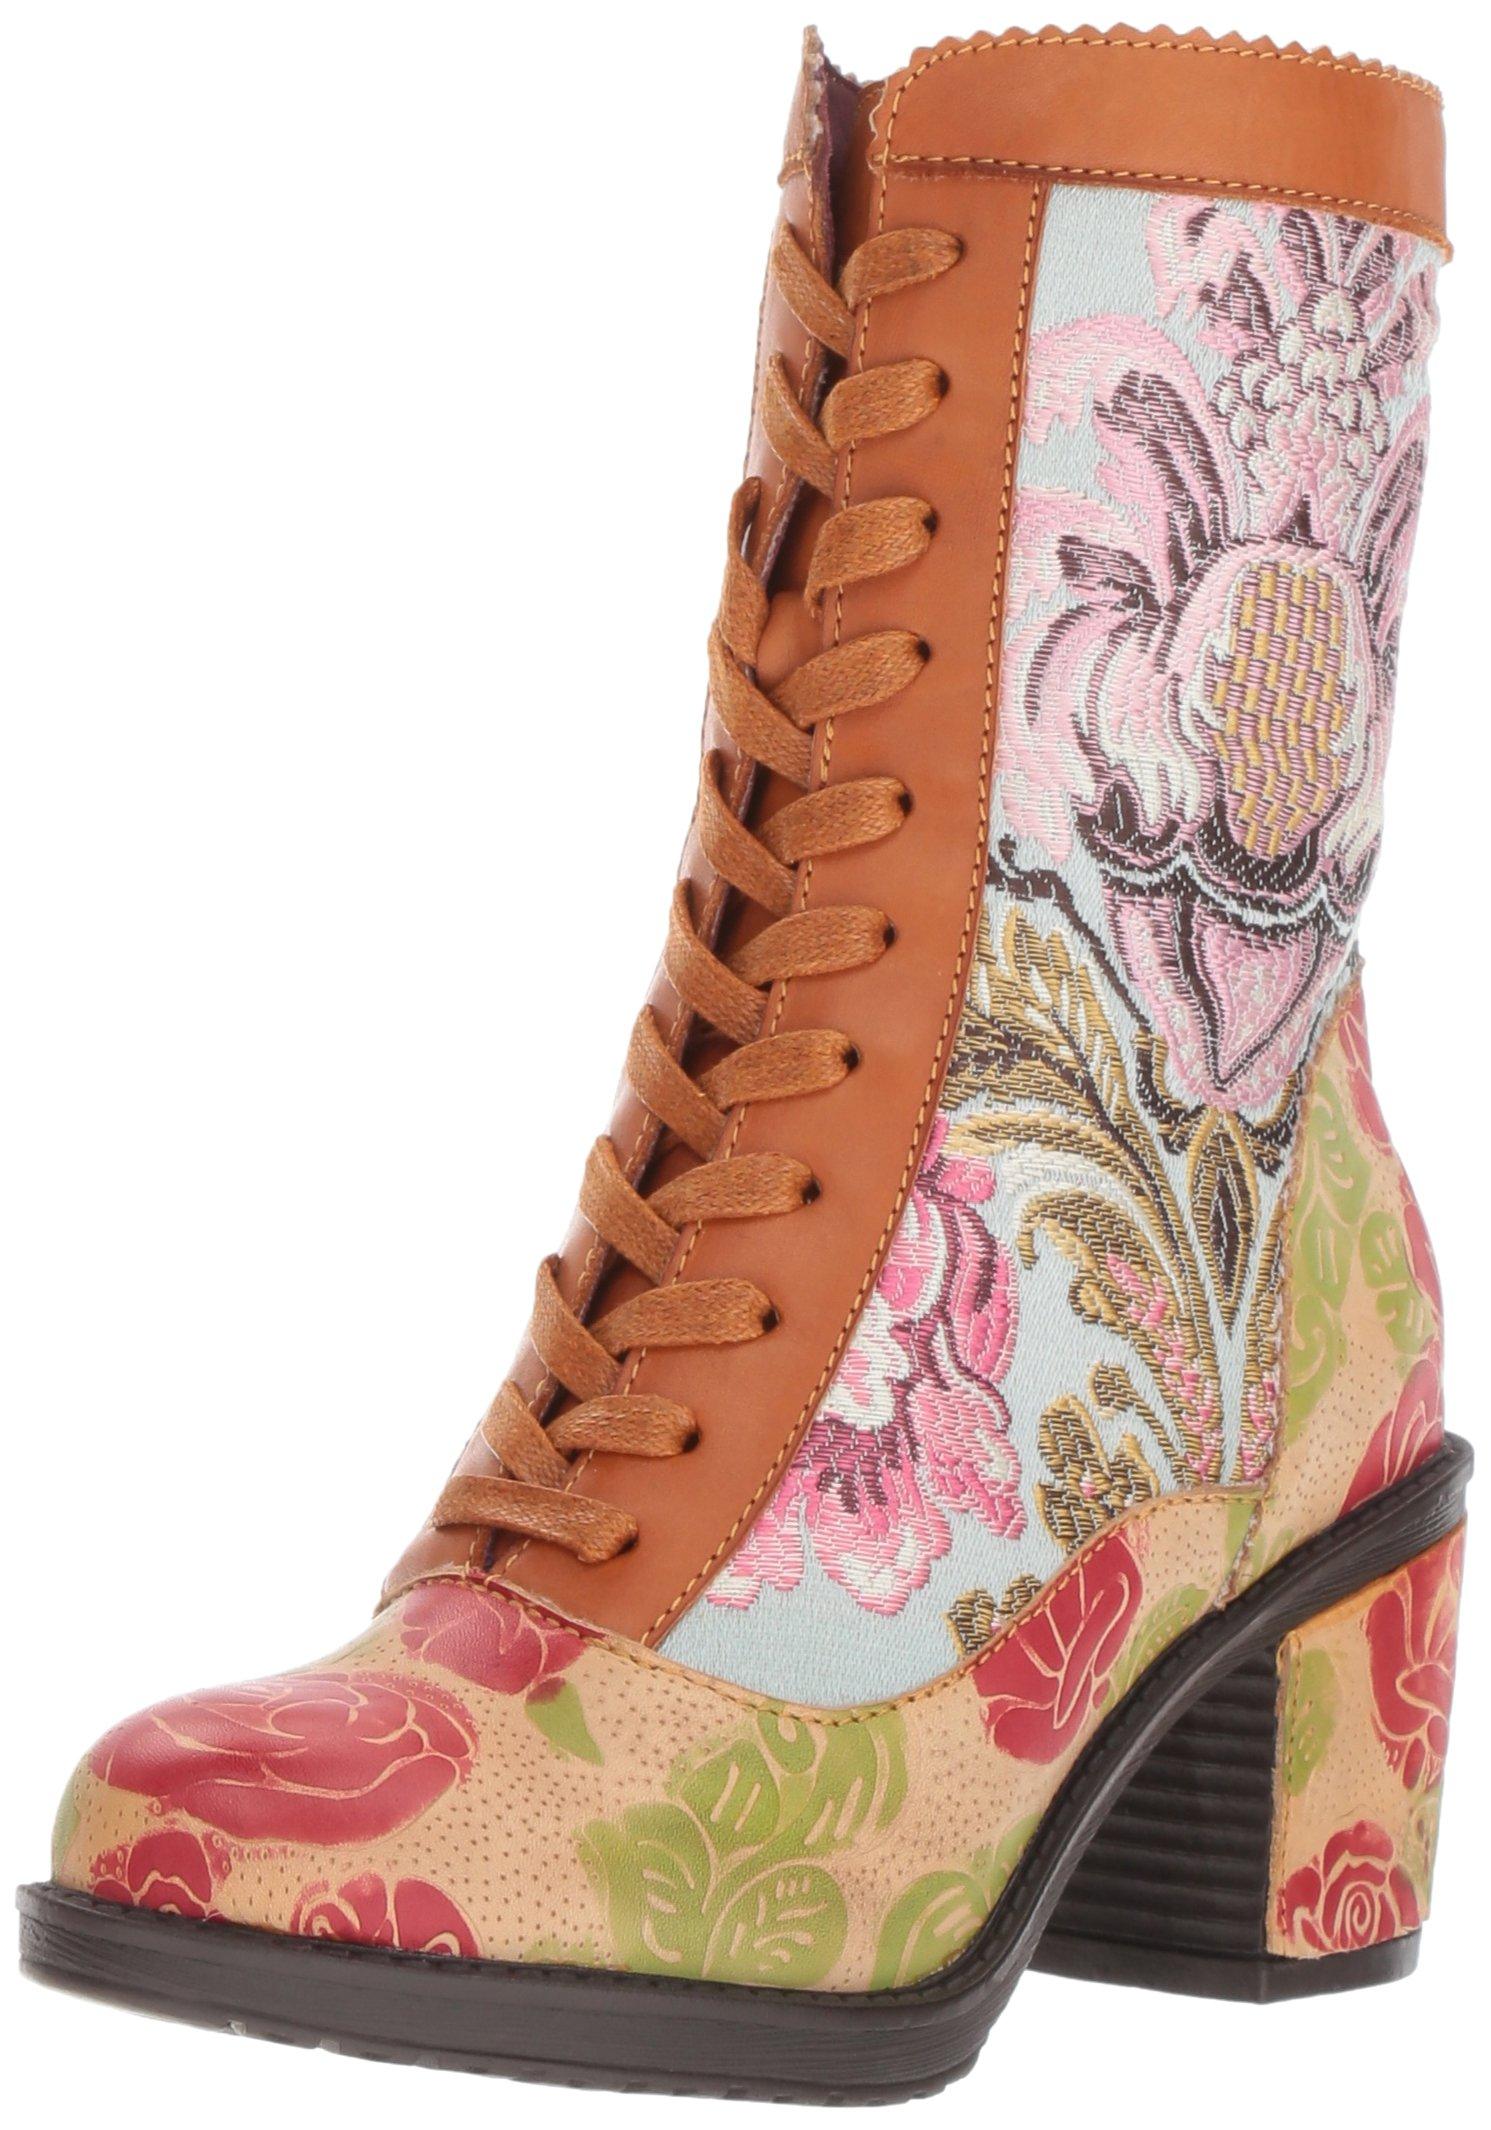 L'Artiste by Spring Step Women's Casandra Boot, Camel, 39 EU/8.5 M US